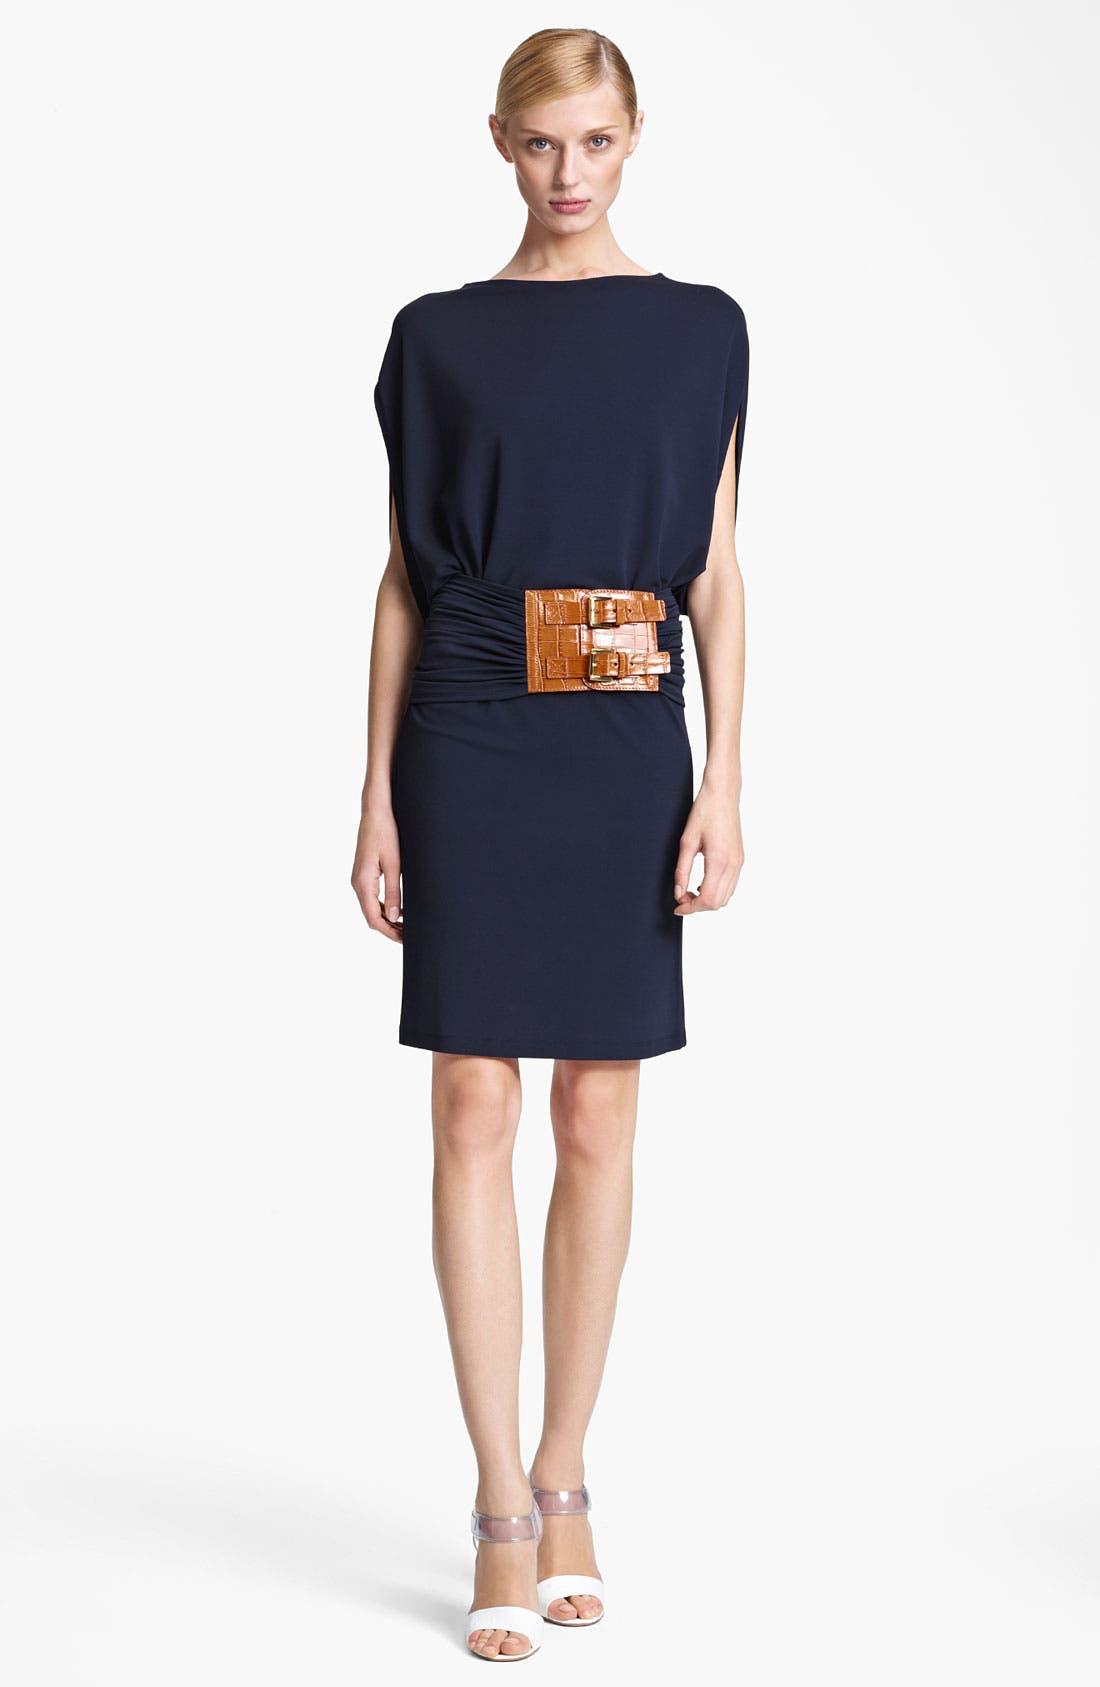 Alternate Image 1 Selected - Michael Kors Flutter Sleeve Matte Jersey Dress